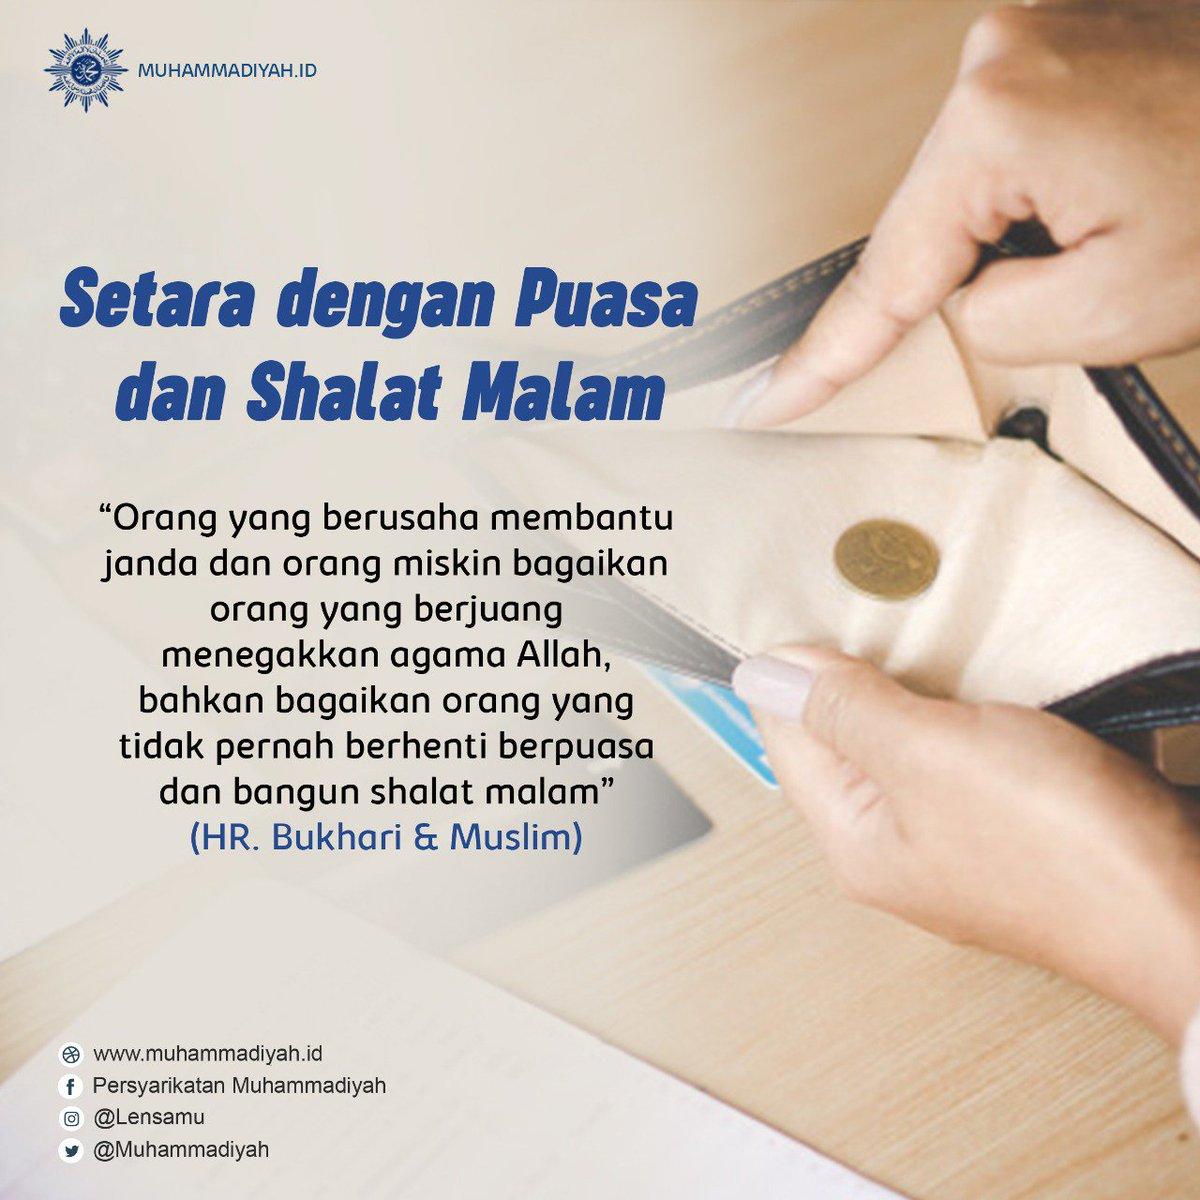 Muhammadiyah No Twitter Orang Yang Berusaha Membantu Janda Dan Orang Miskin Bagaikan Orang Yang Berjuang Menegakkan Agama Allah Swt Muhammadiyah Quote Https T Co Bhbdzhlqyf